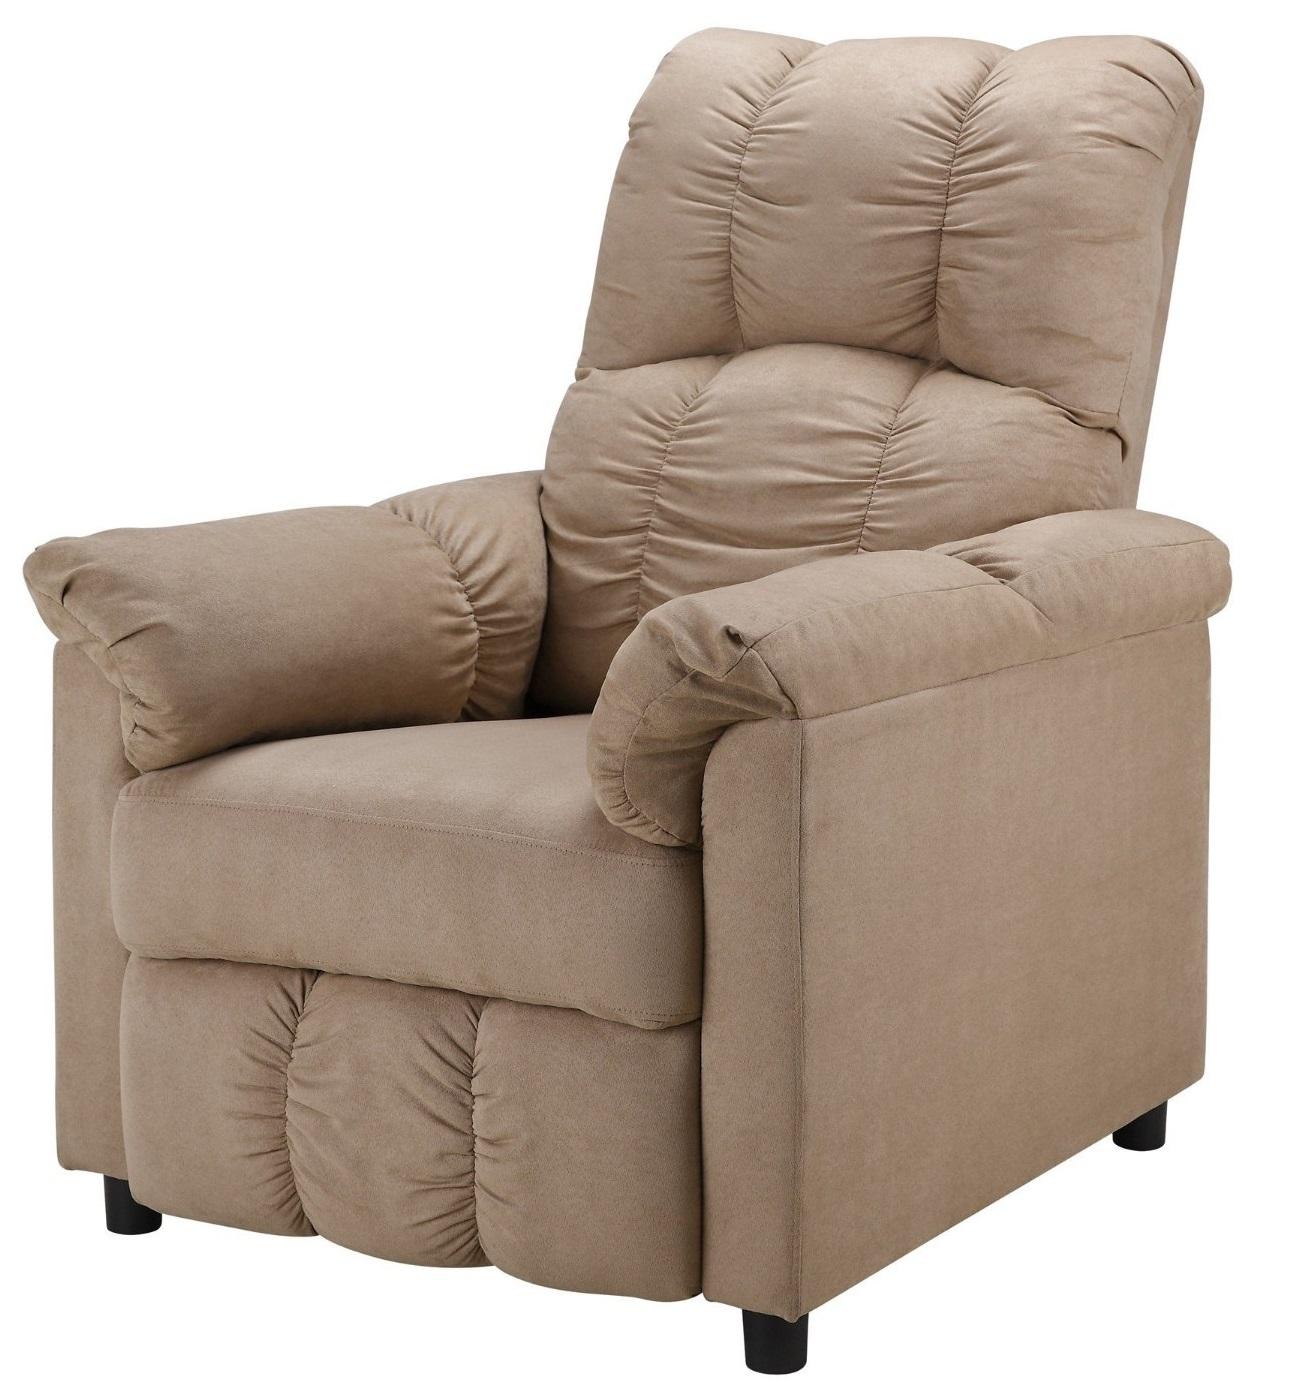 Slim Recliner Chair Nursery  imgbbcom